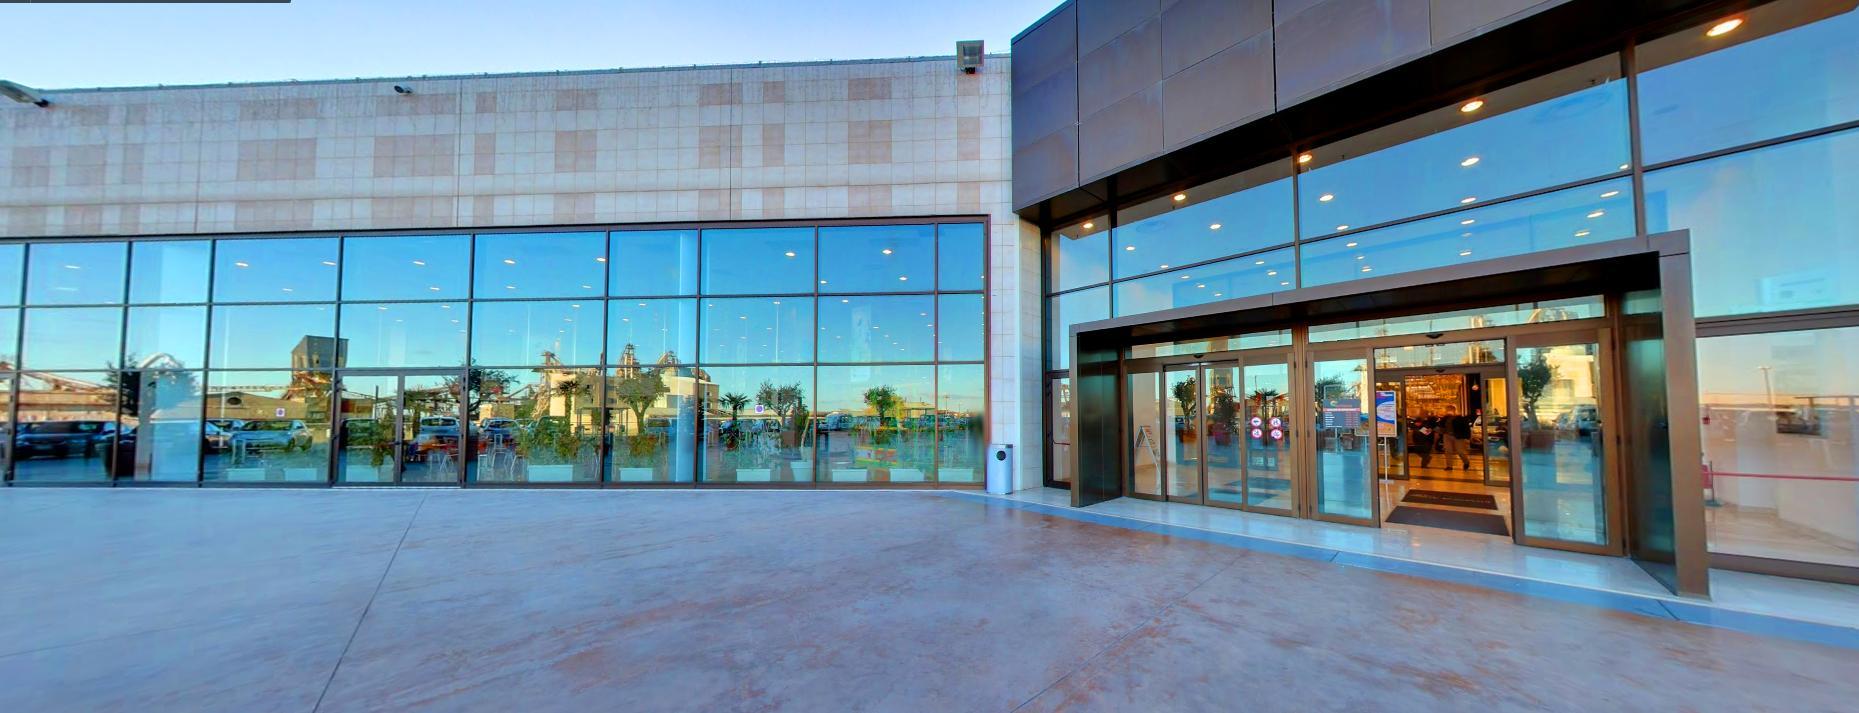 Centro Commerciale Le Masserie